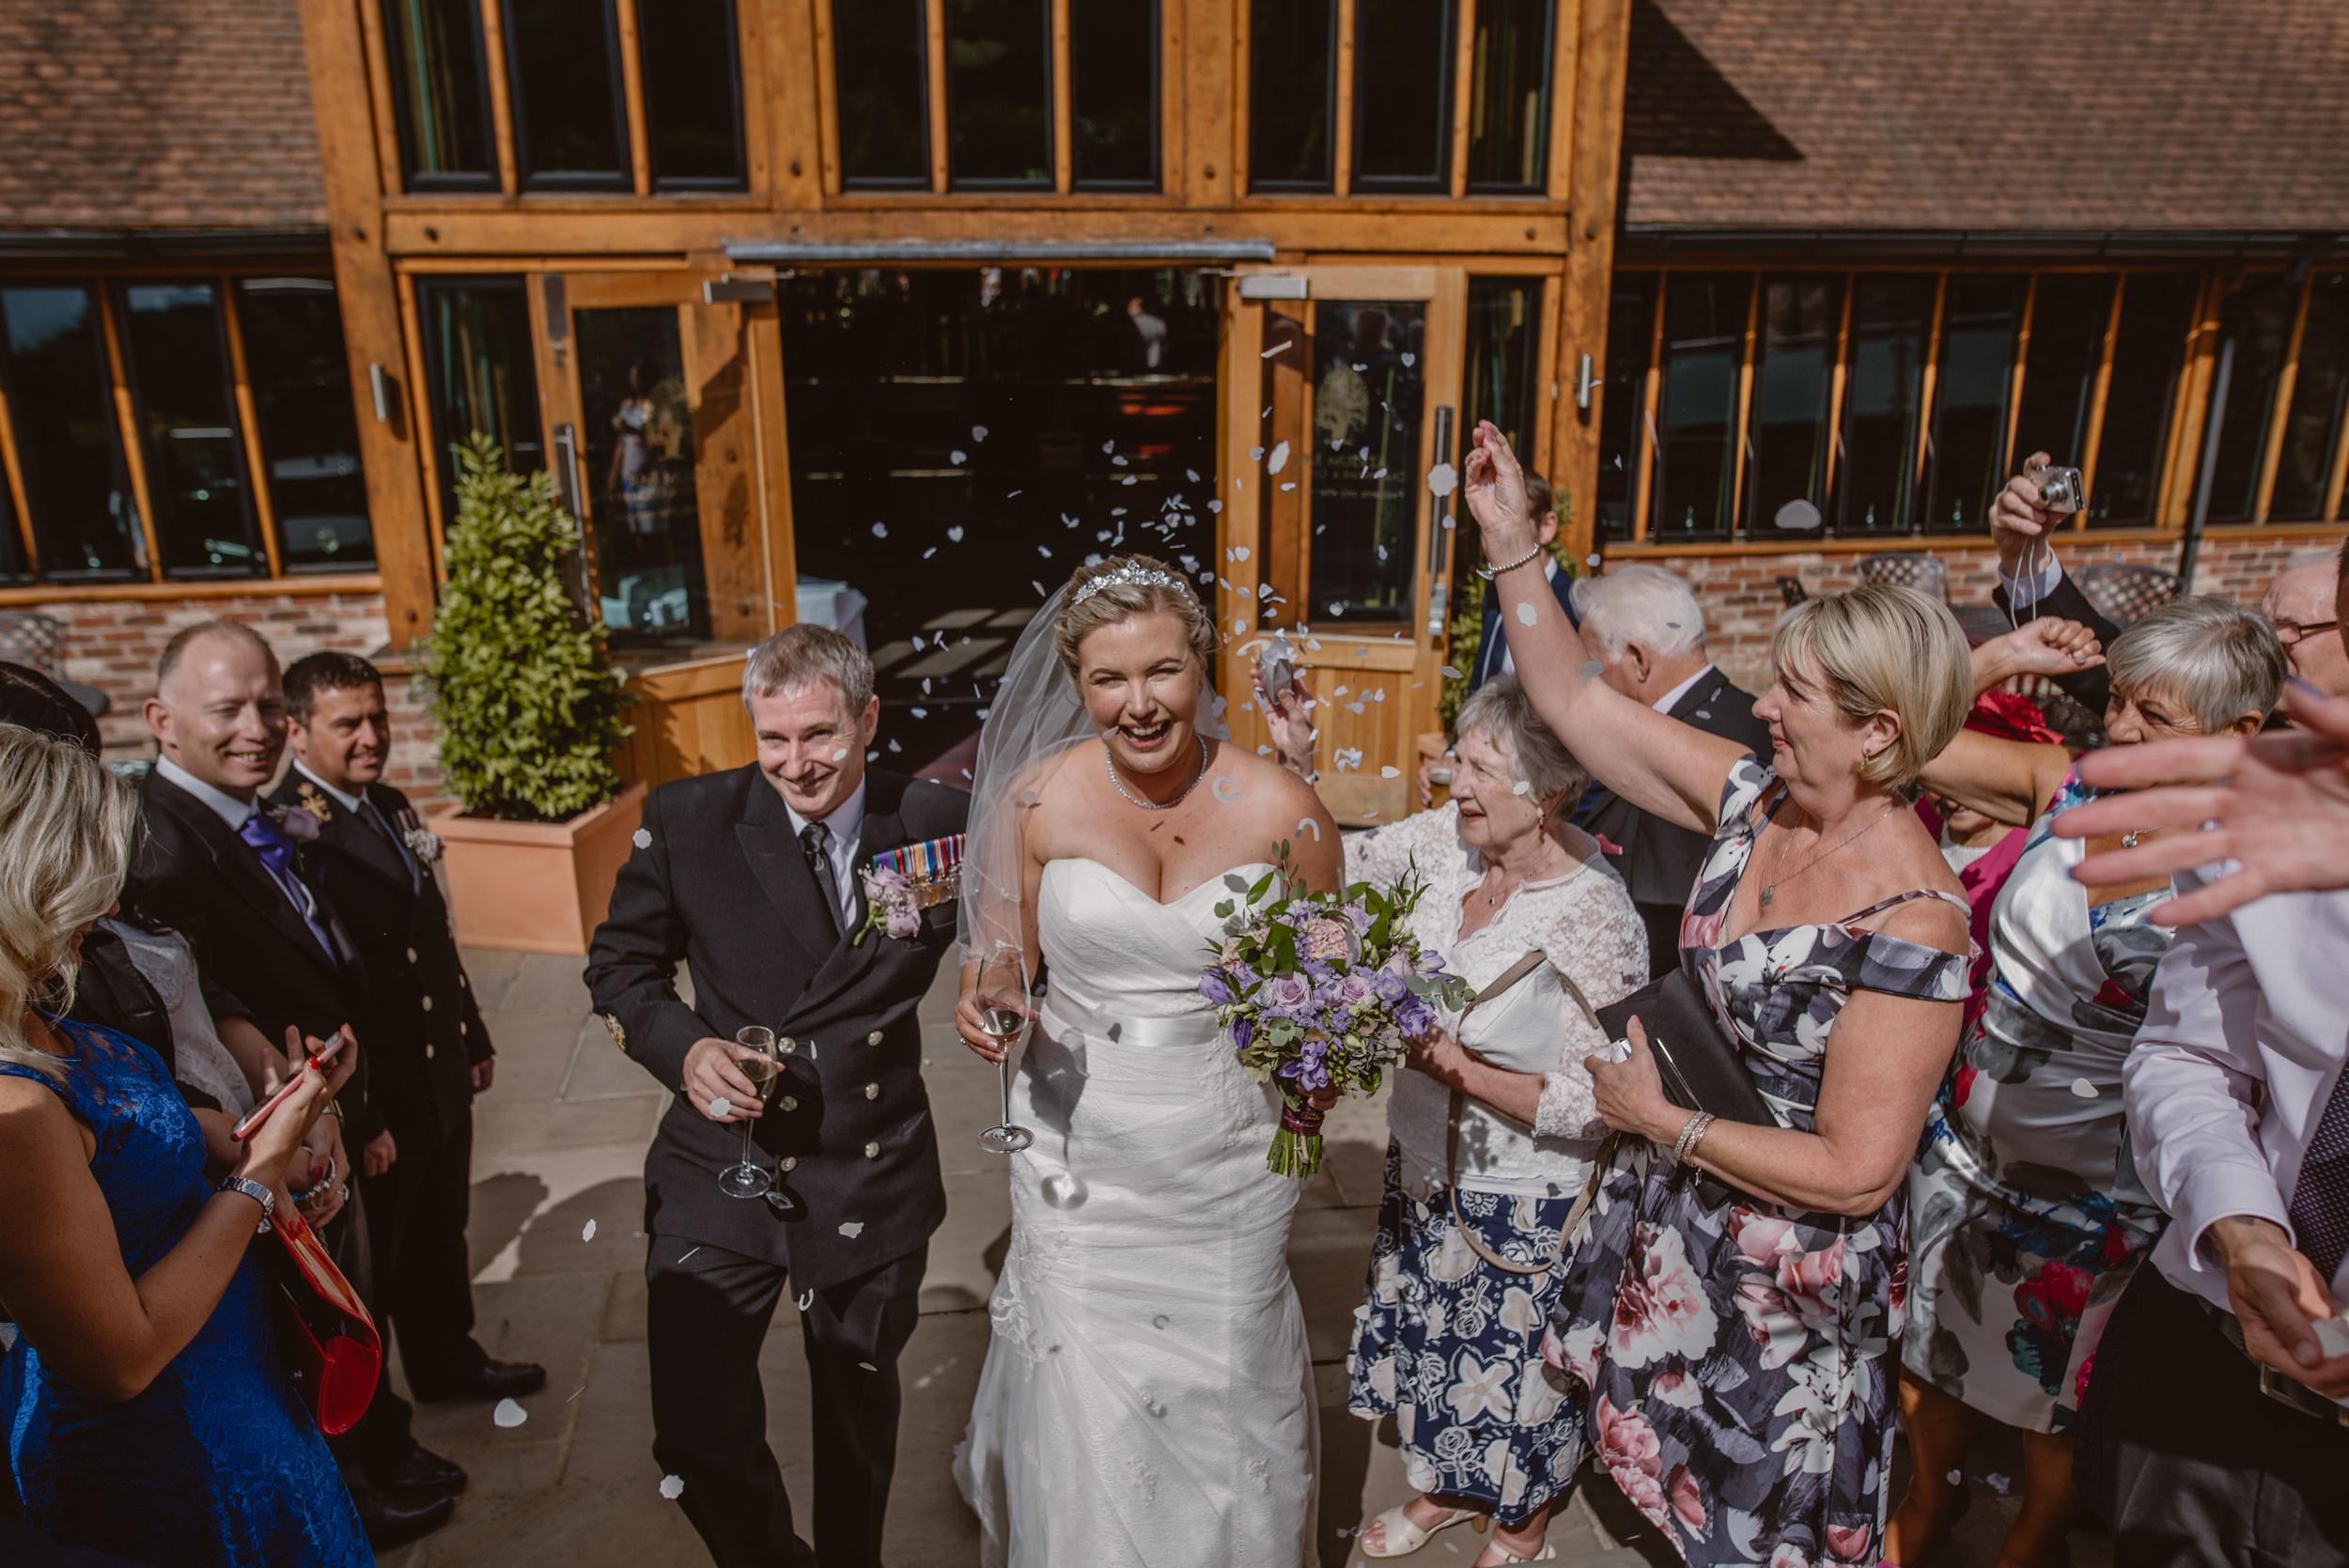 Chantelle-and-Stephen-Old-Thorns-Hotel-Wedding-Liphook-Manu-Mendoza-Wedding-Photography-261.jpg